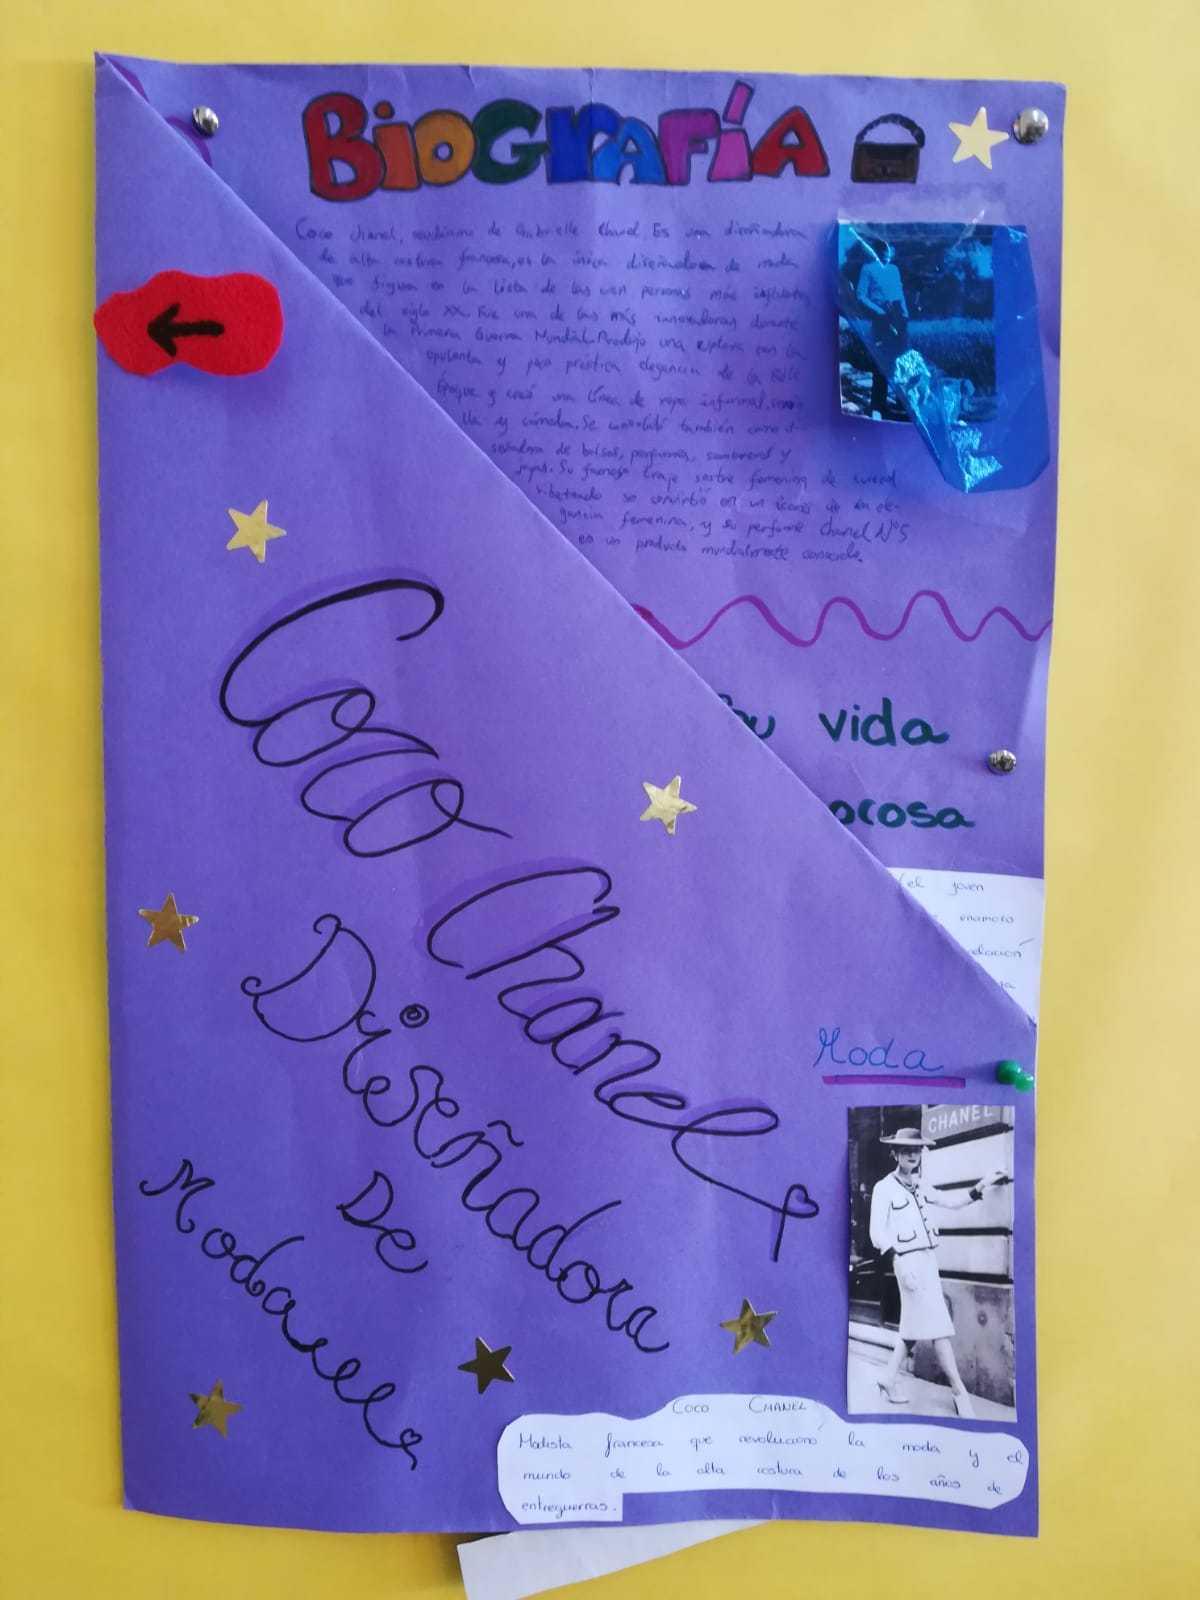 2019_03_20_Los lapbook de 6ºA toman forma_CEIP FDLR_Las Rozas 6